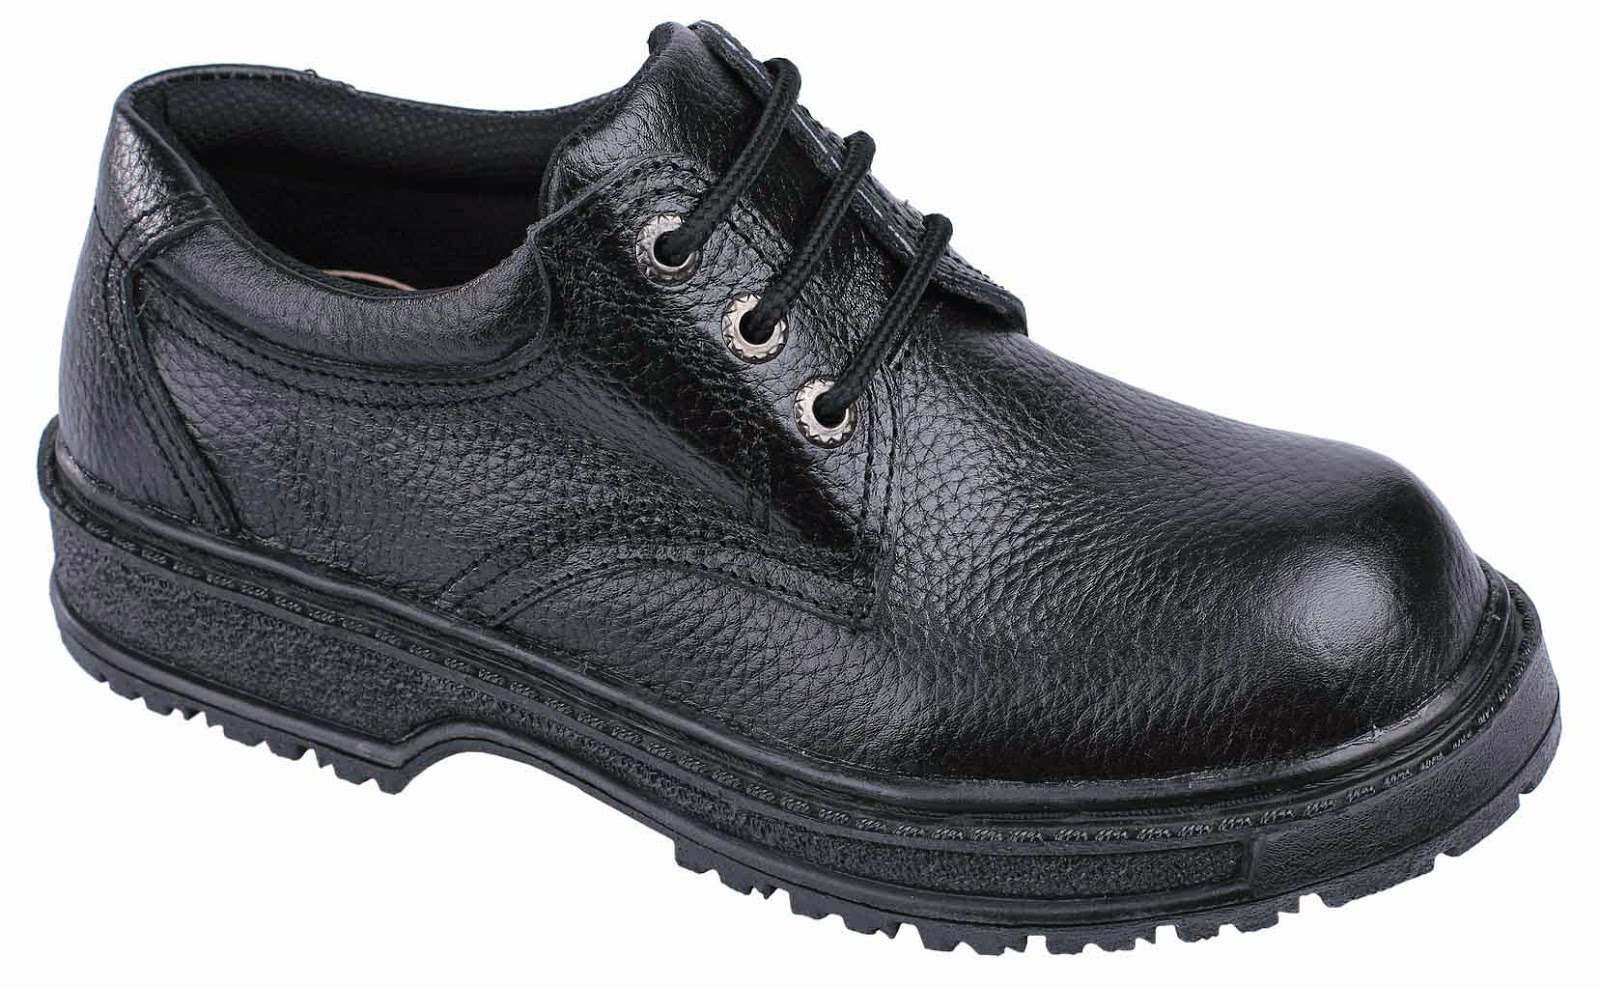 Sepatu safety cibaduyut murah, jual sepatu safety murah, sepatu safety kulit asli, sepatu safety model 2015